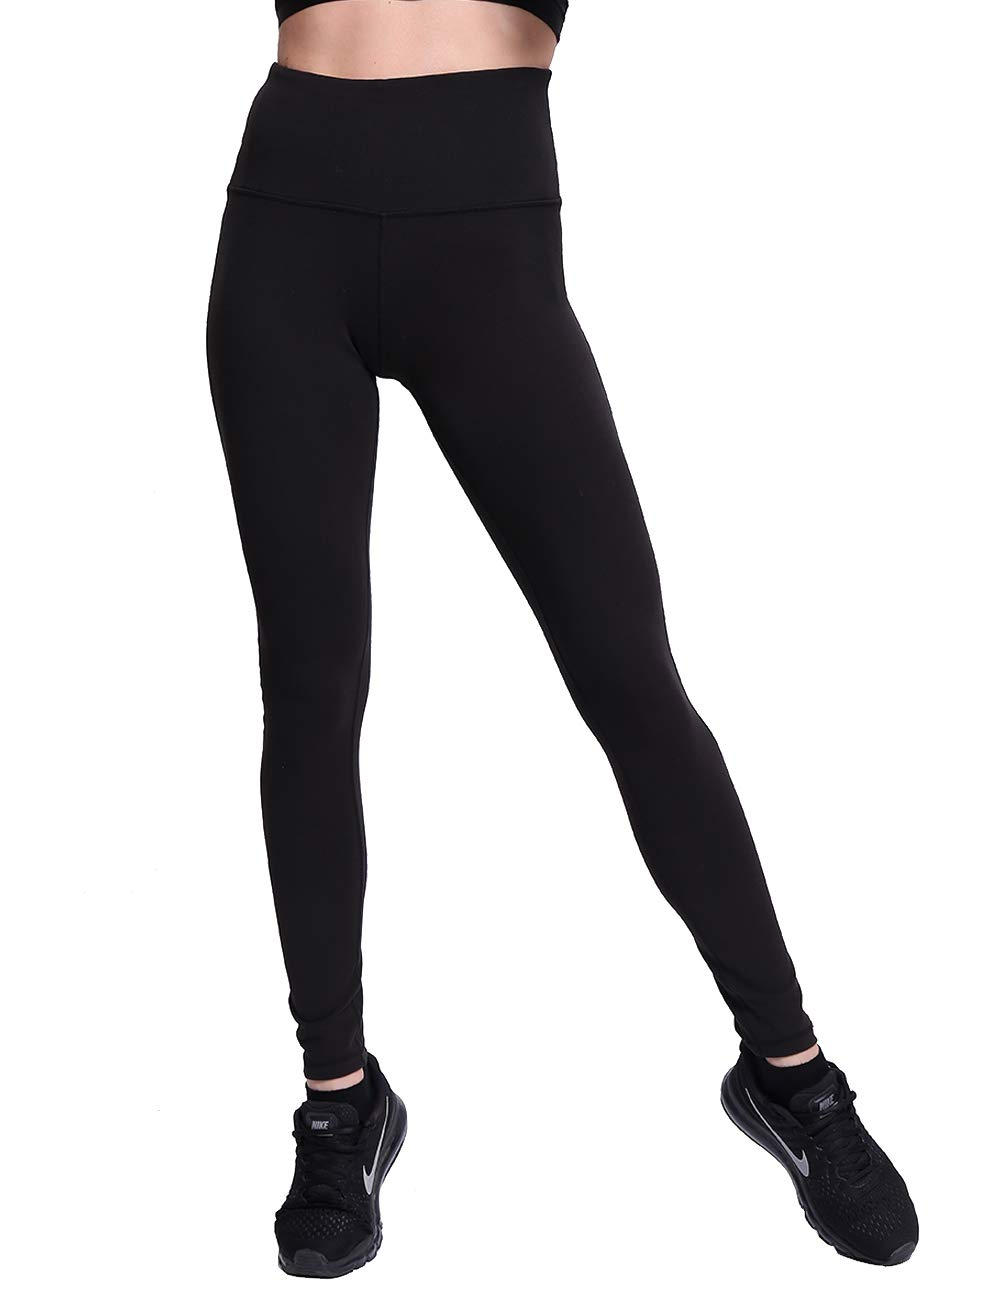 8b0e862e556 NORMOV High Waist Yoga Pants for Women-Stretchy Inner Hidden Pockets ...